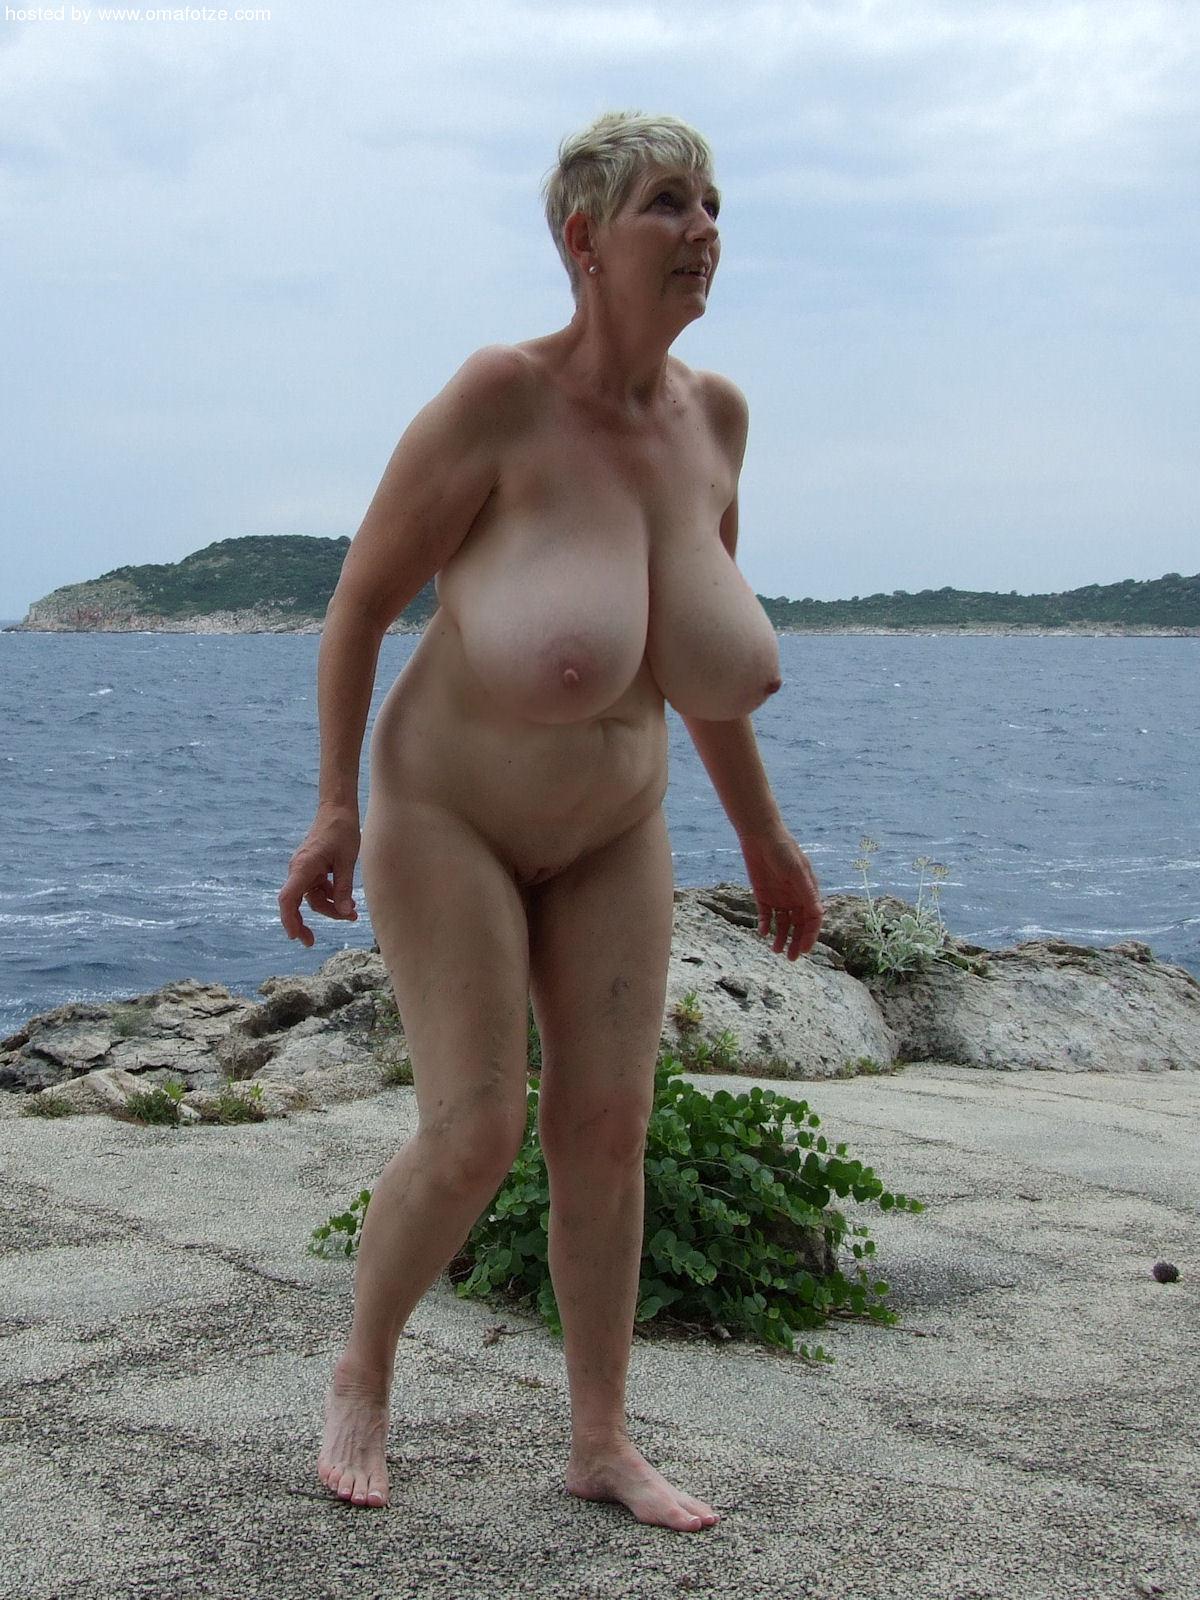 Ass tits nude beach big